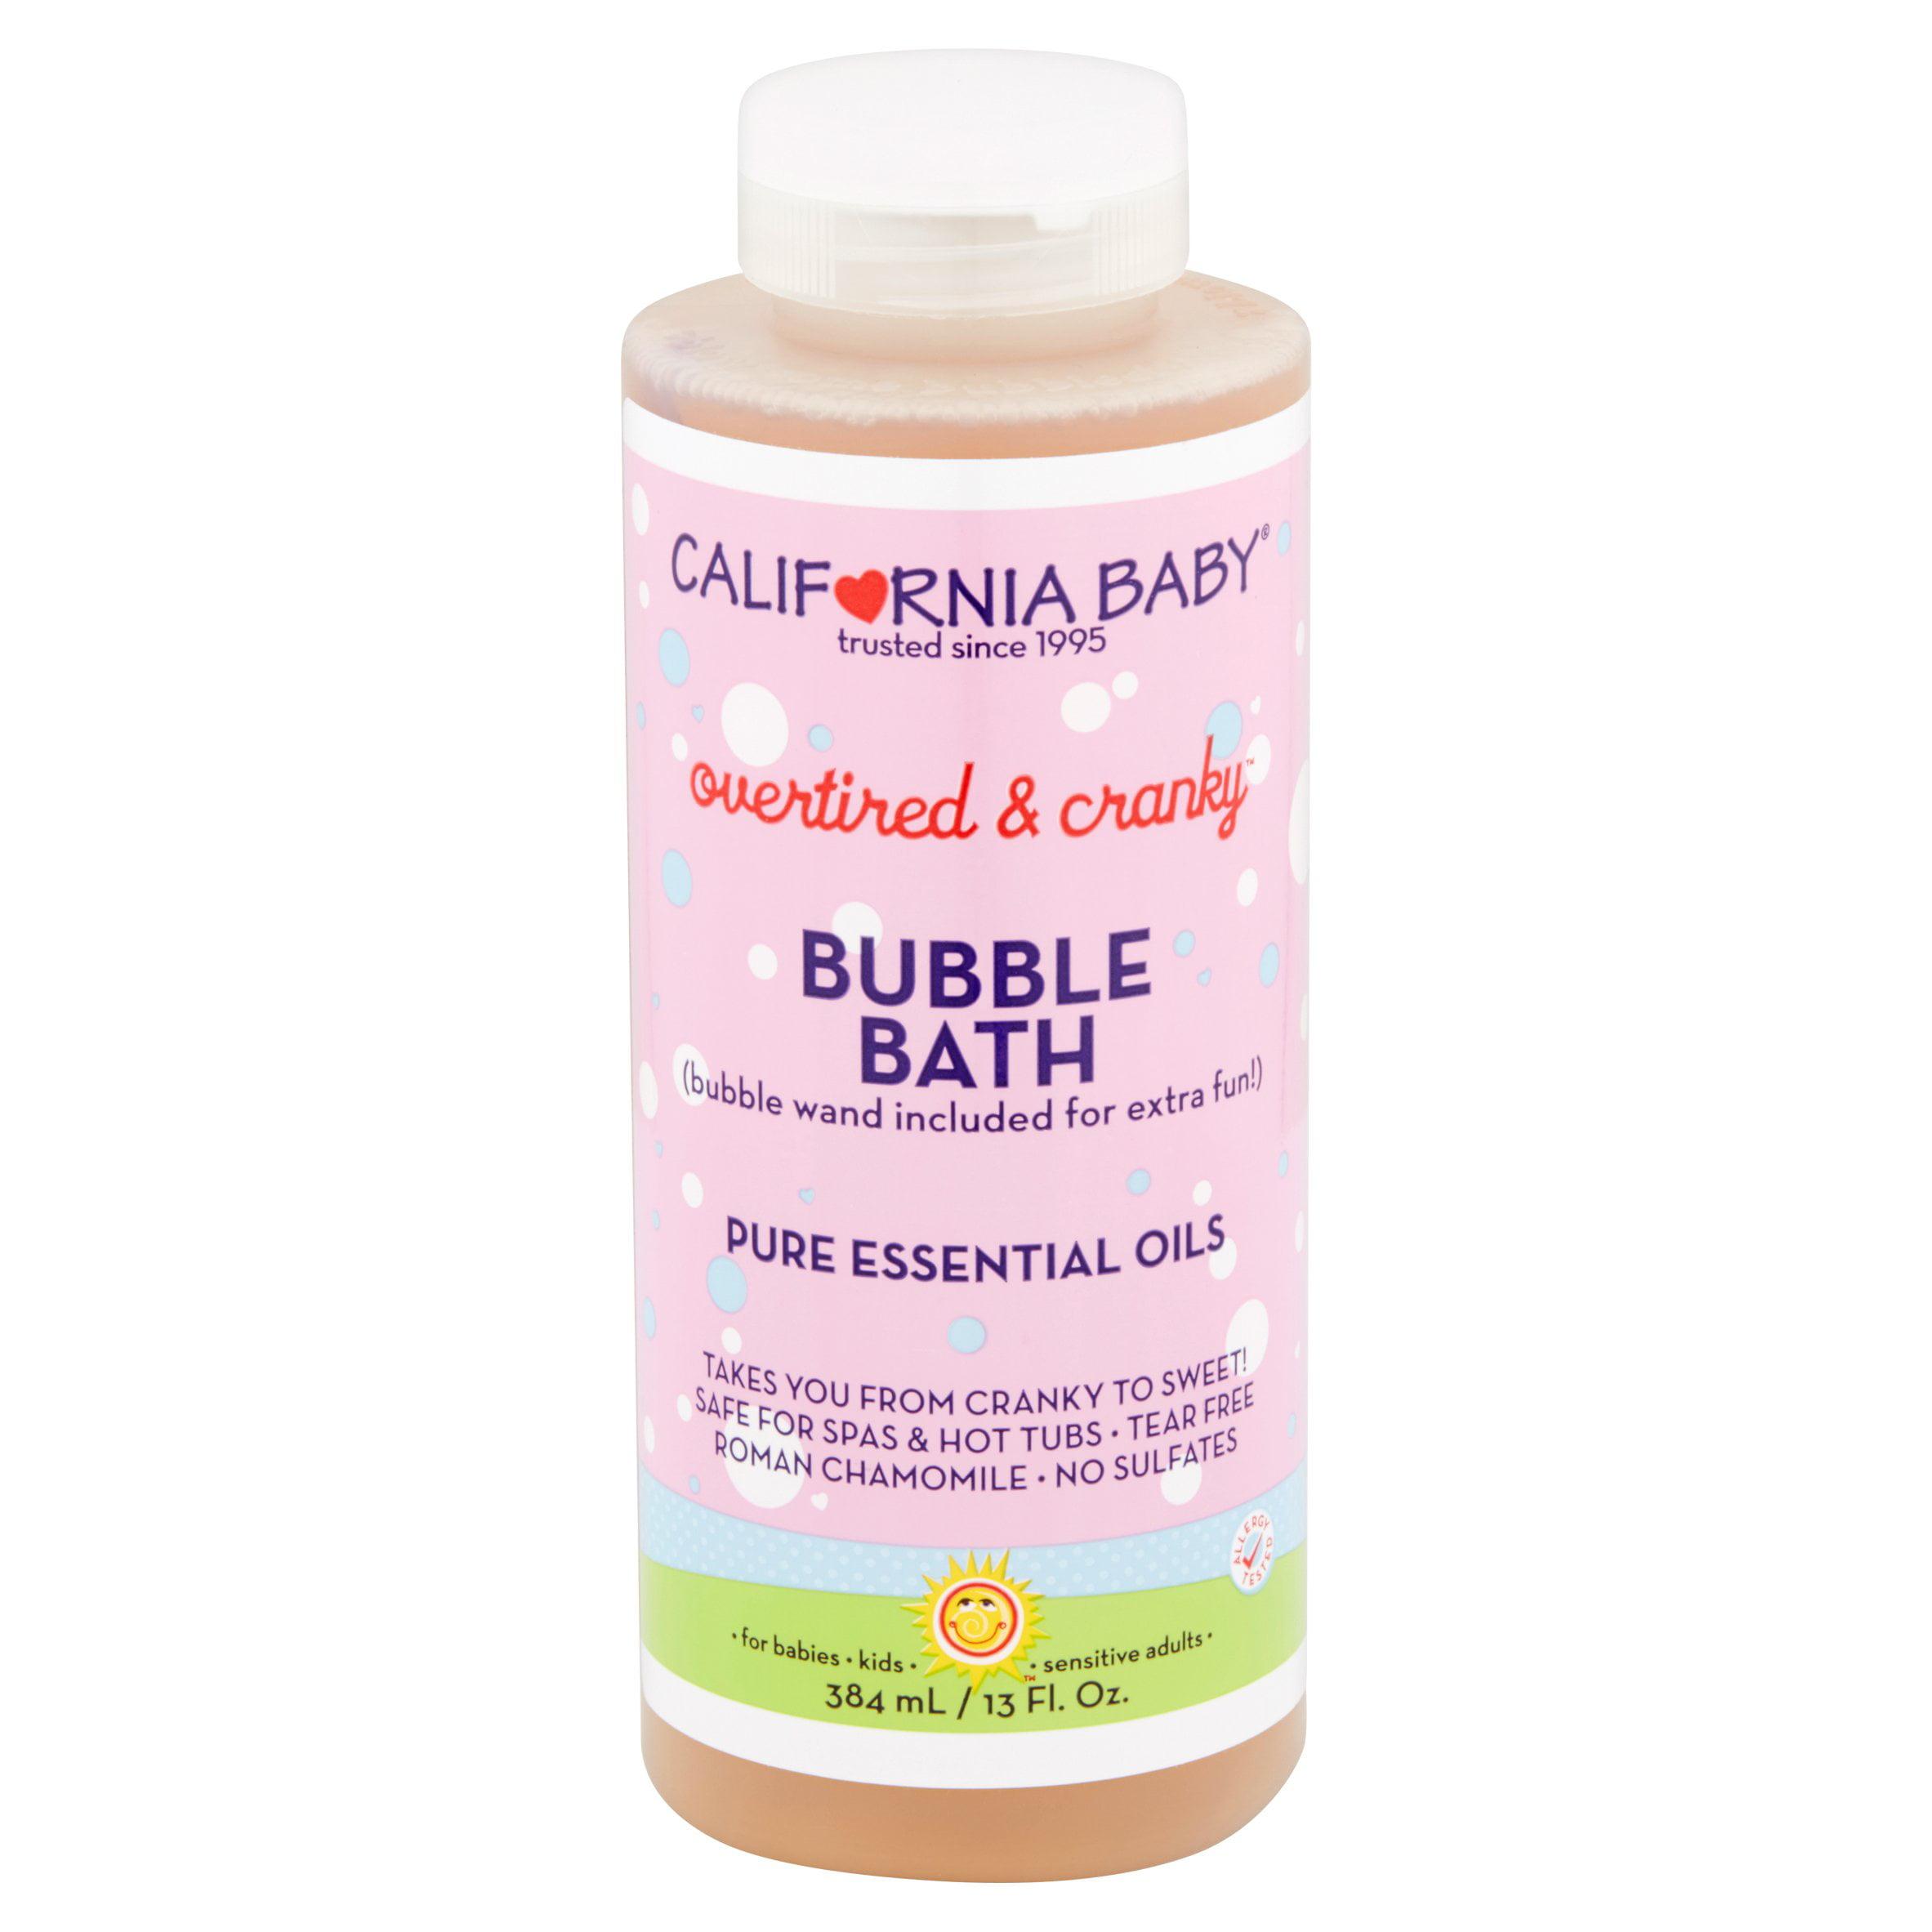 California Baby Overtired & Cranky Bubble Bath, 13 fl oz by California Baby